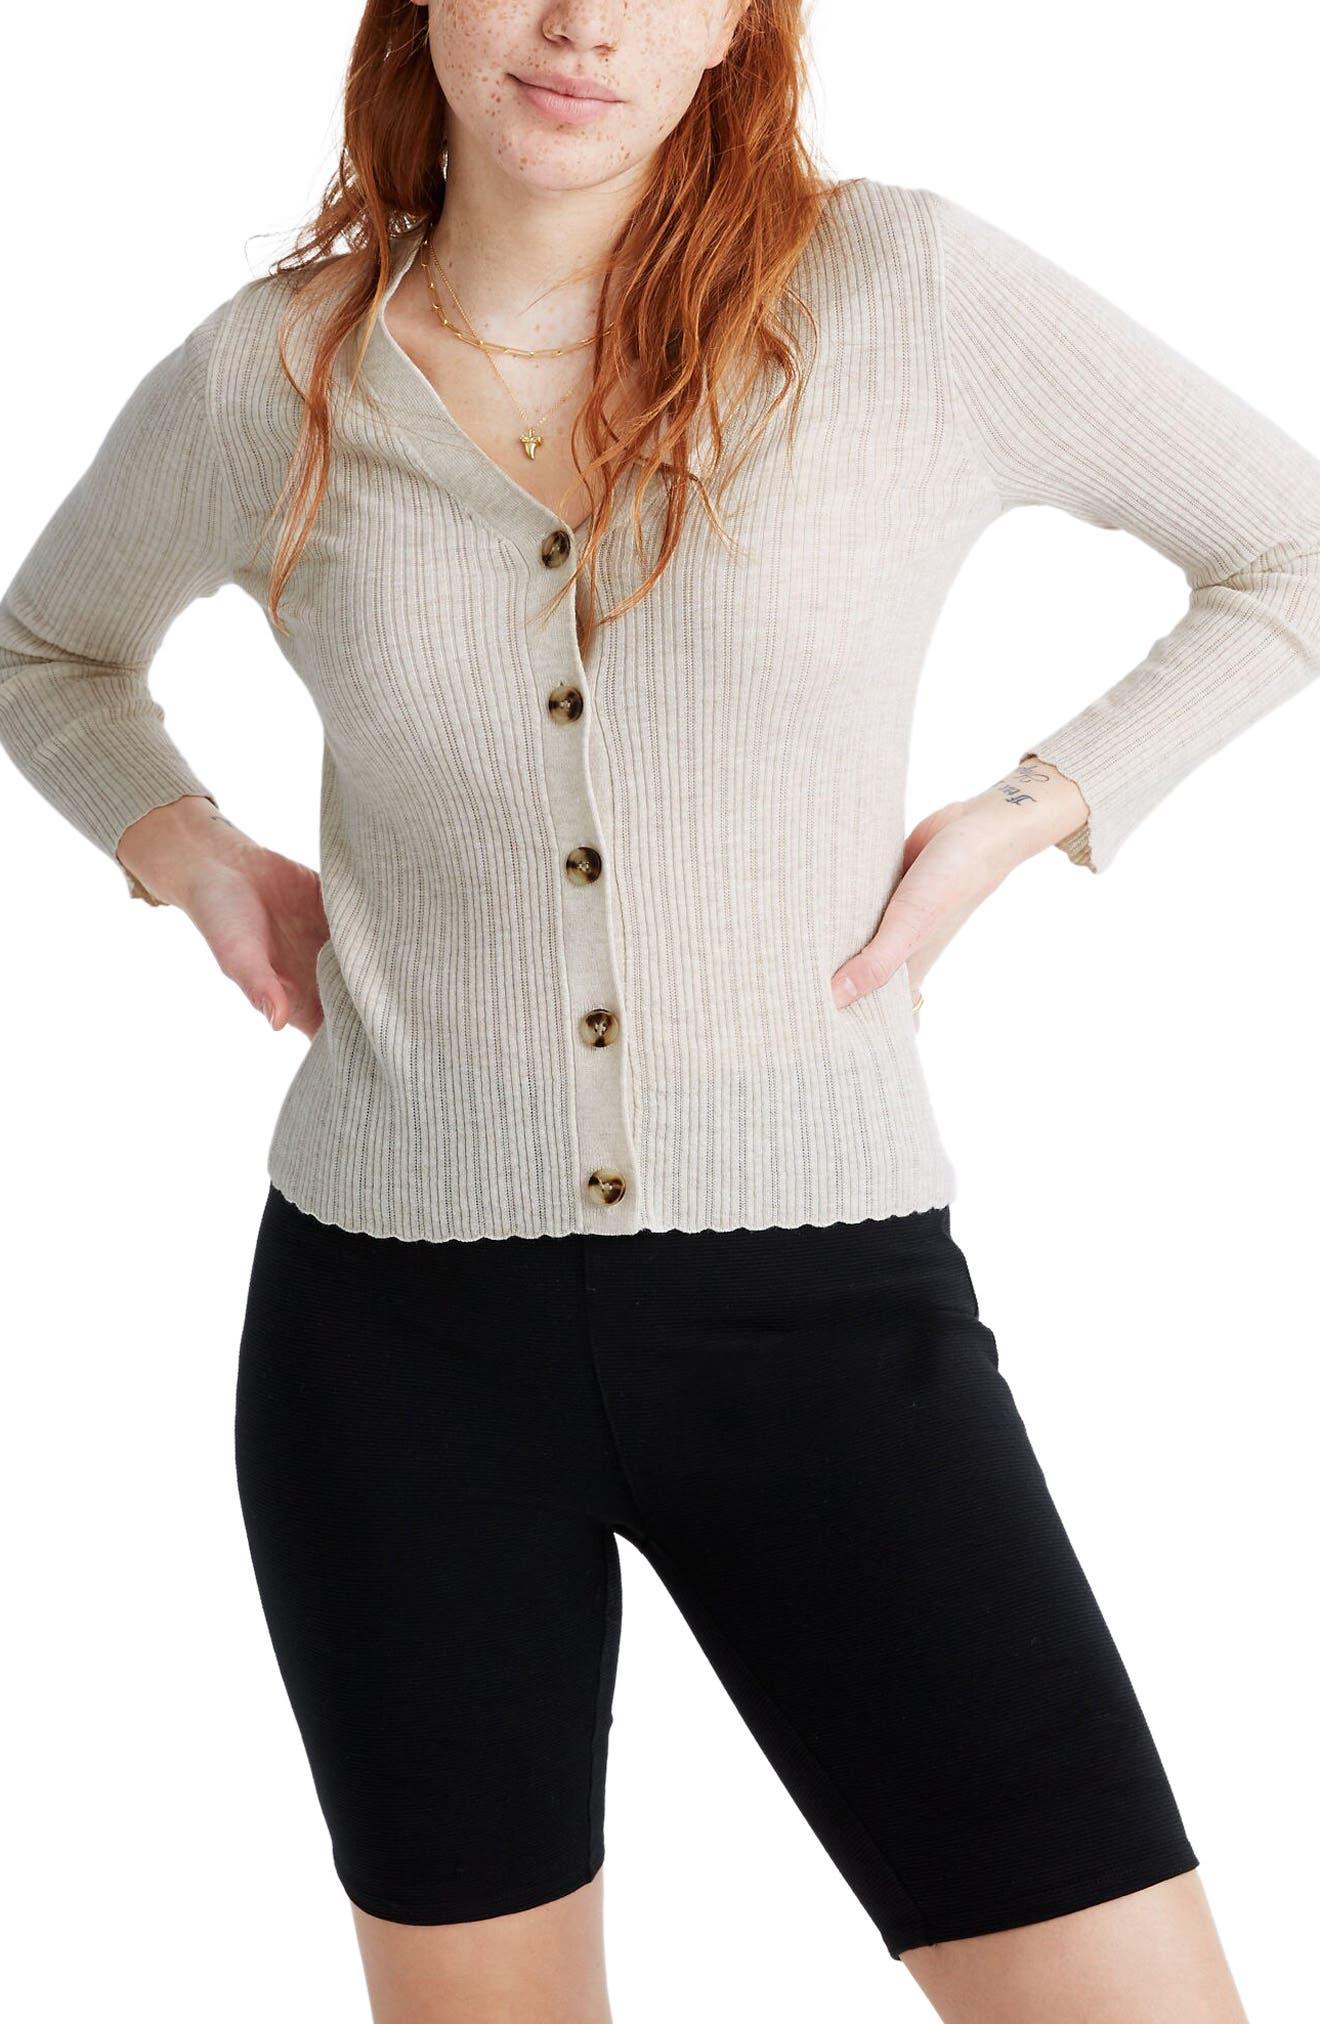 Image of Madewell Altona Pointelle Knit Cardigan